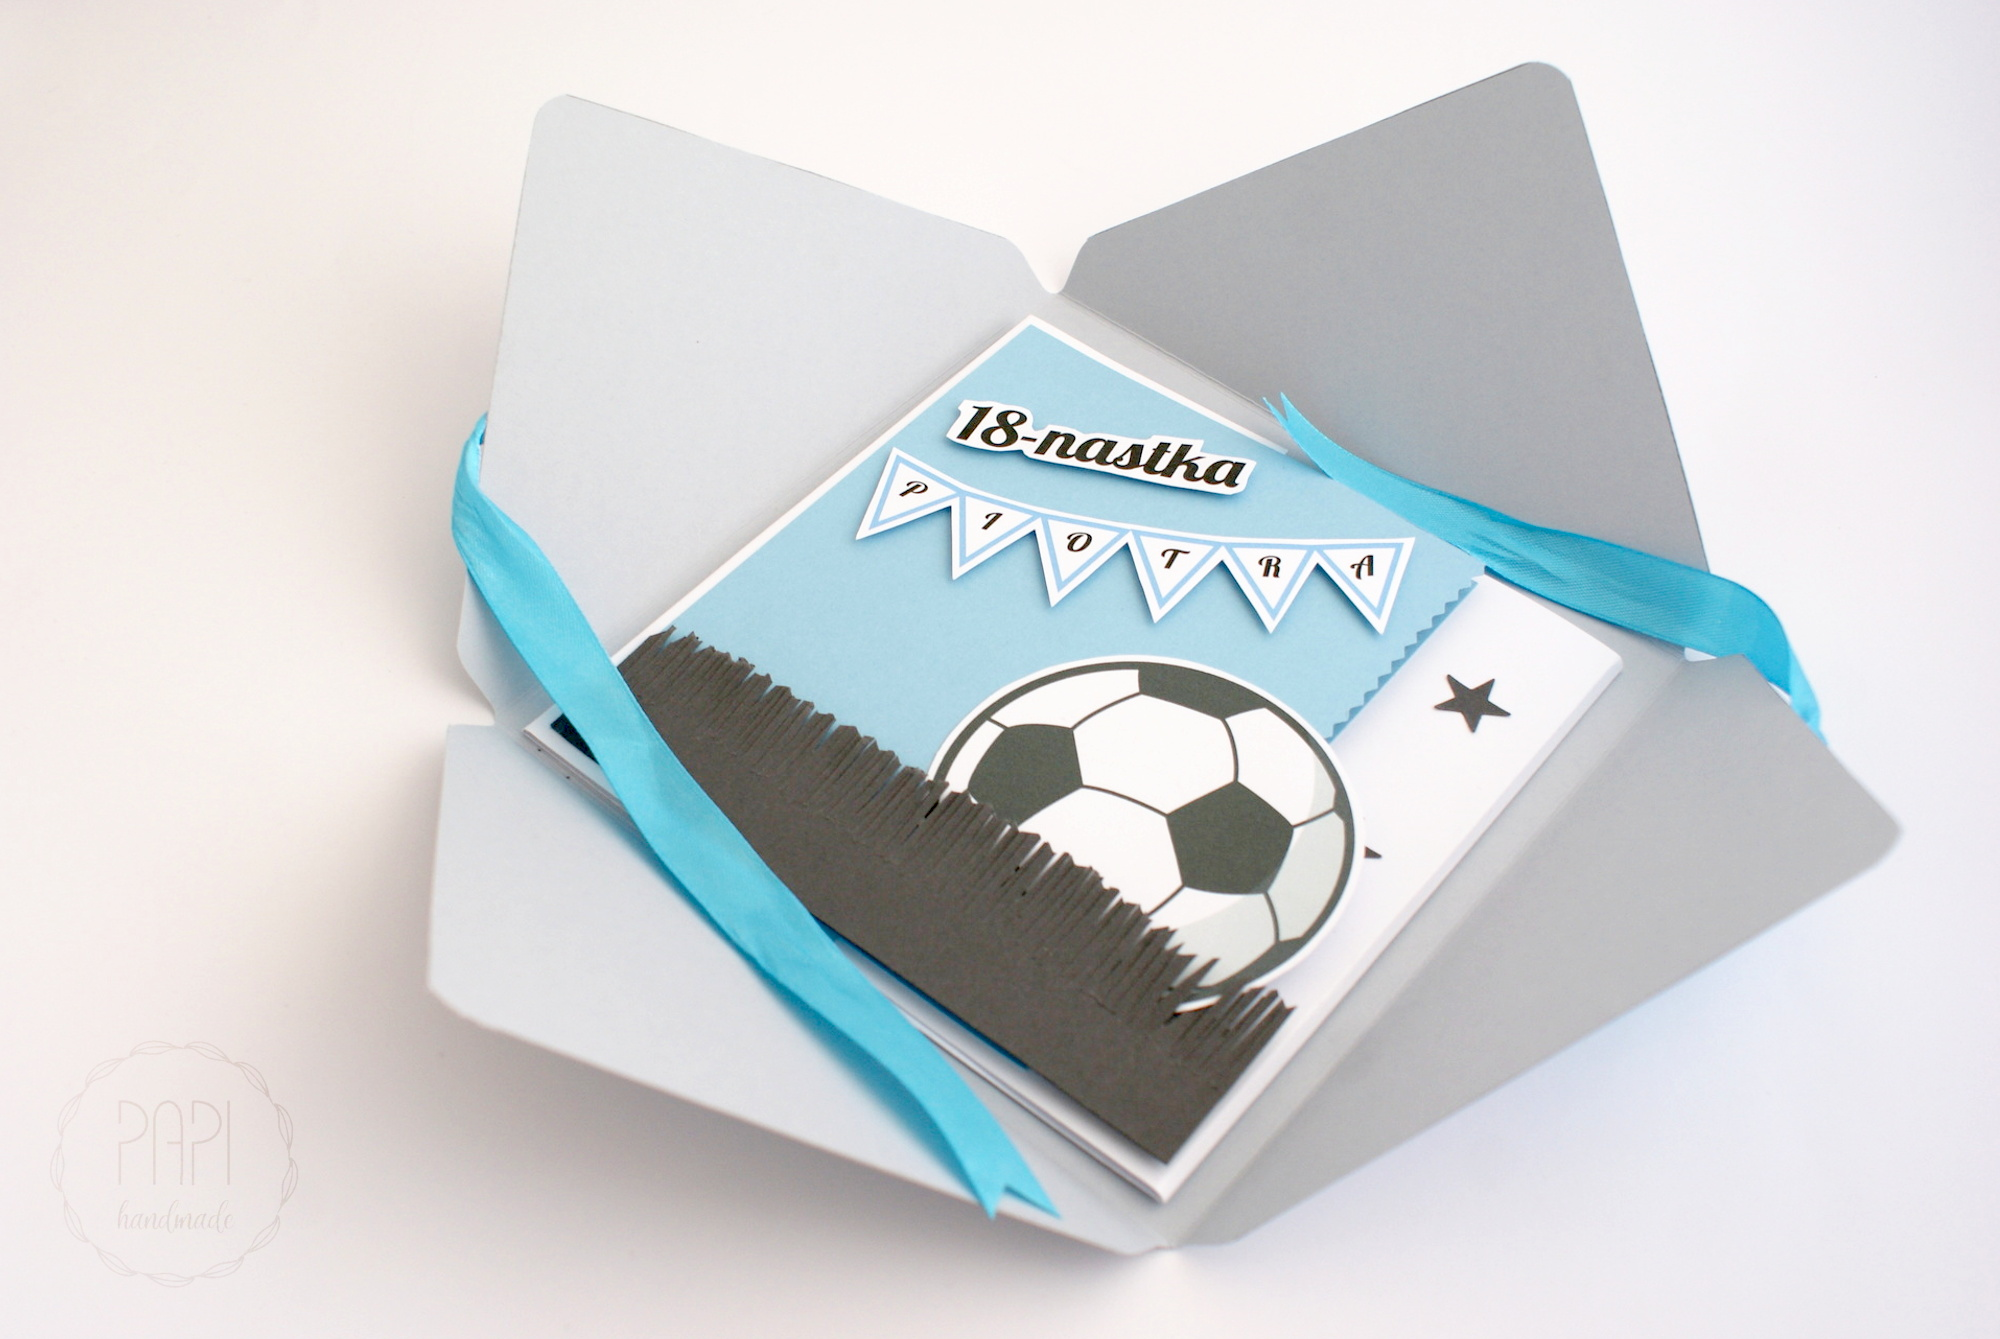 kartka dla kibica lech poznań handmade